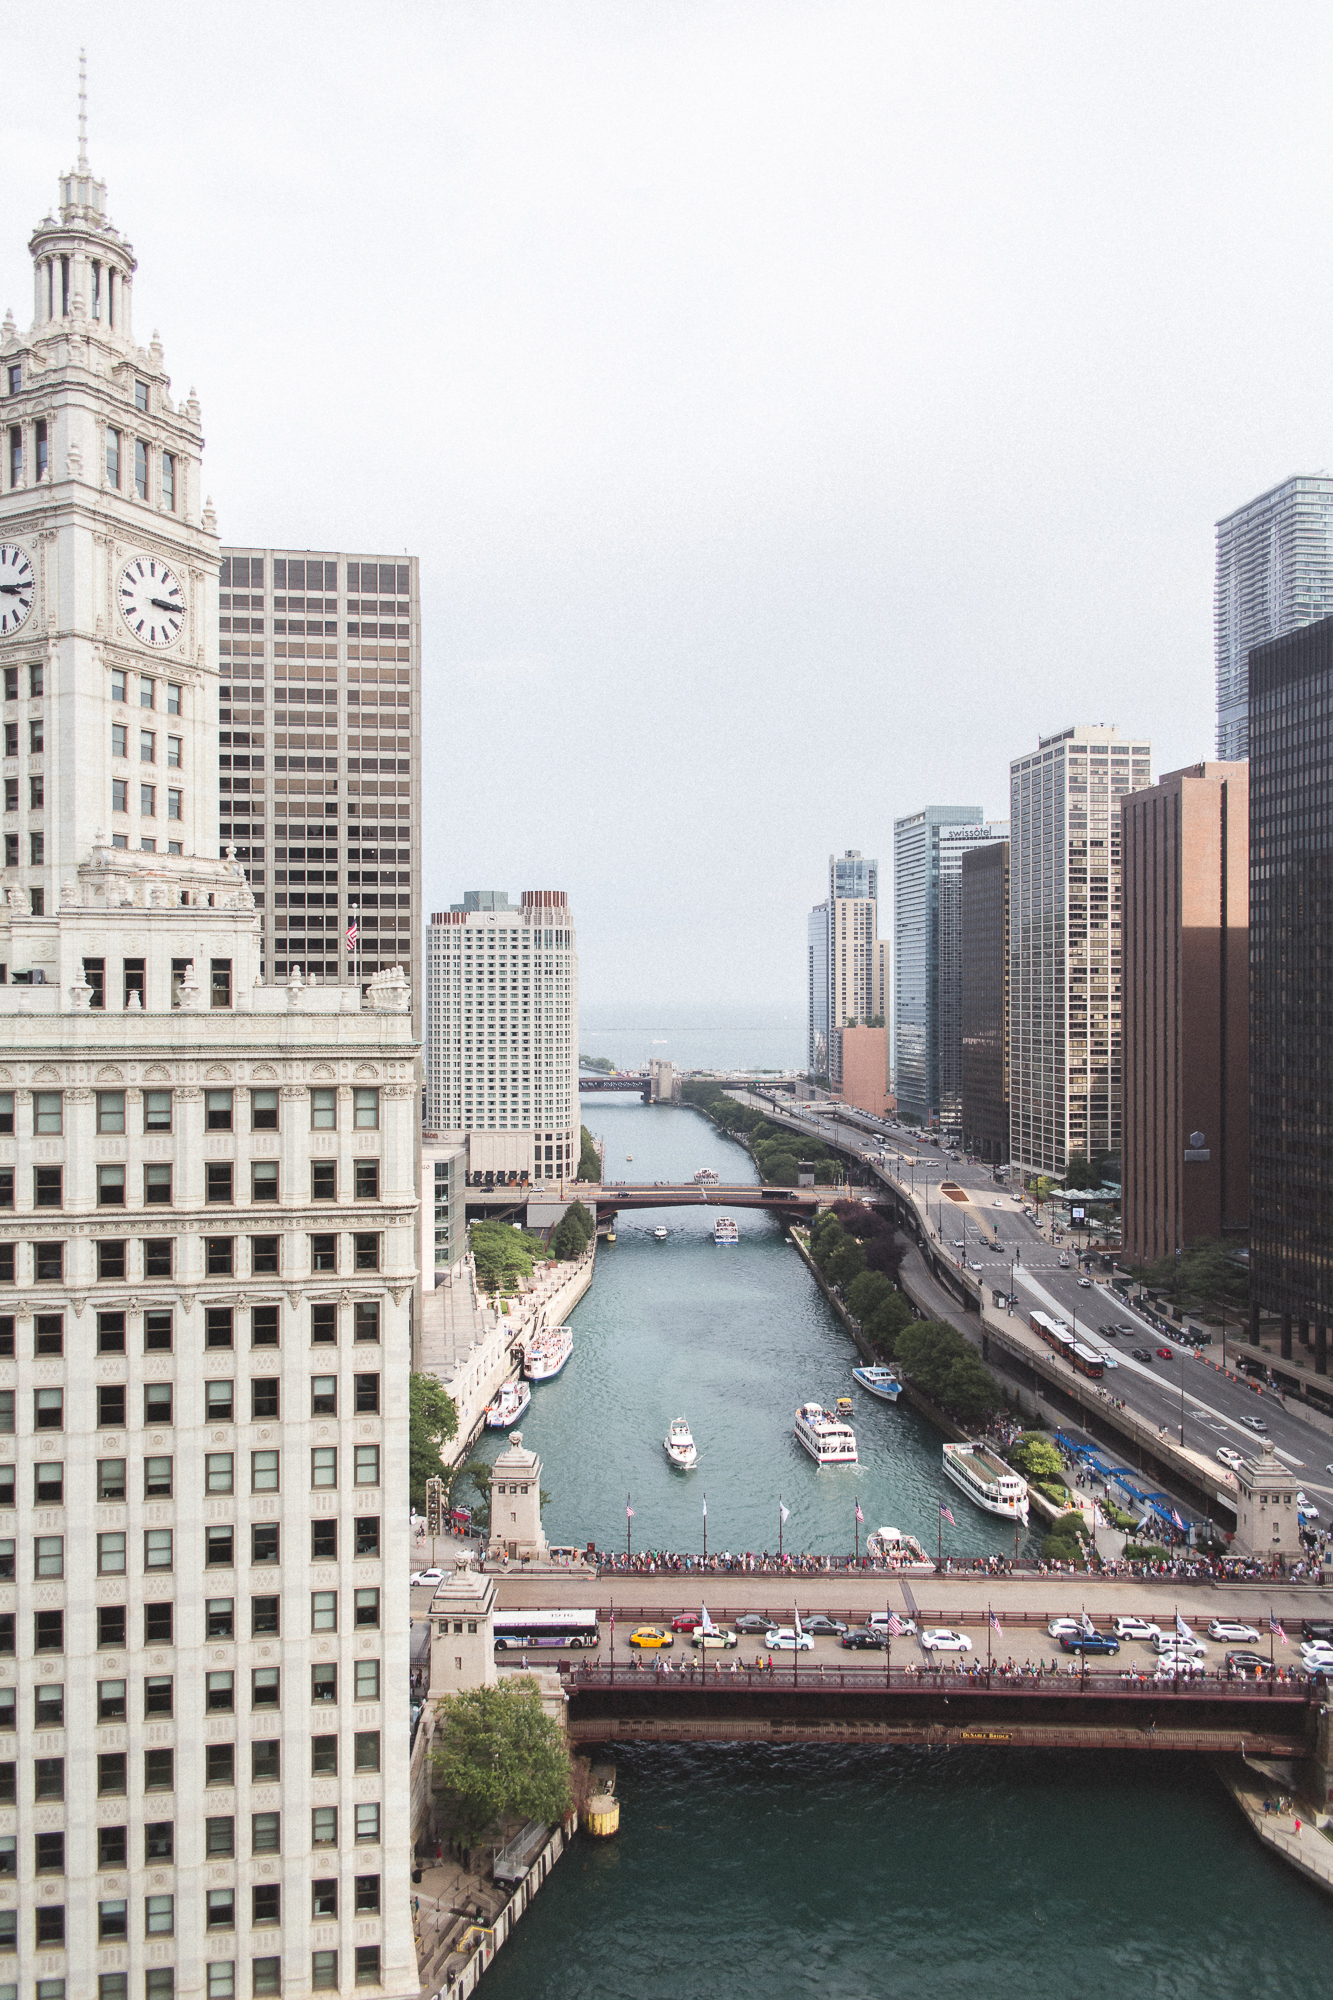 Chicago Illinois - DiBlasio Photography-3.jpg